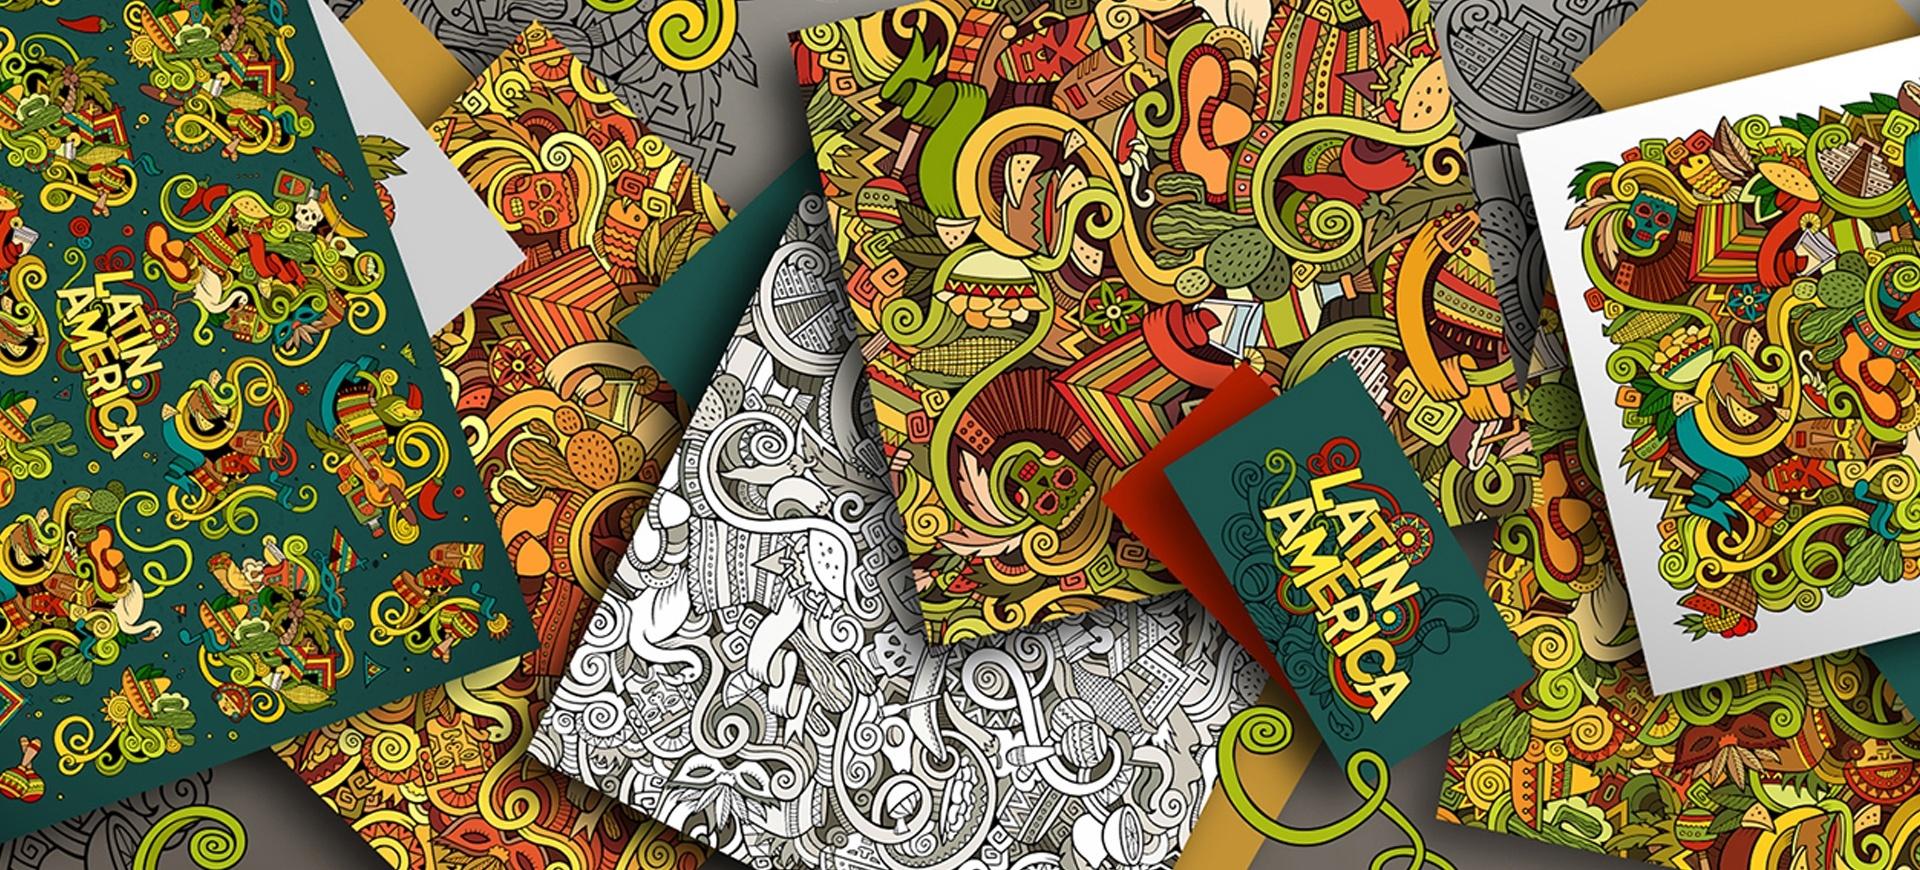 39+ Doodle Patterns & Backgrounds   Free & Premium Templates - Free Printable Doodle Patterns